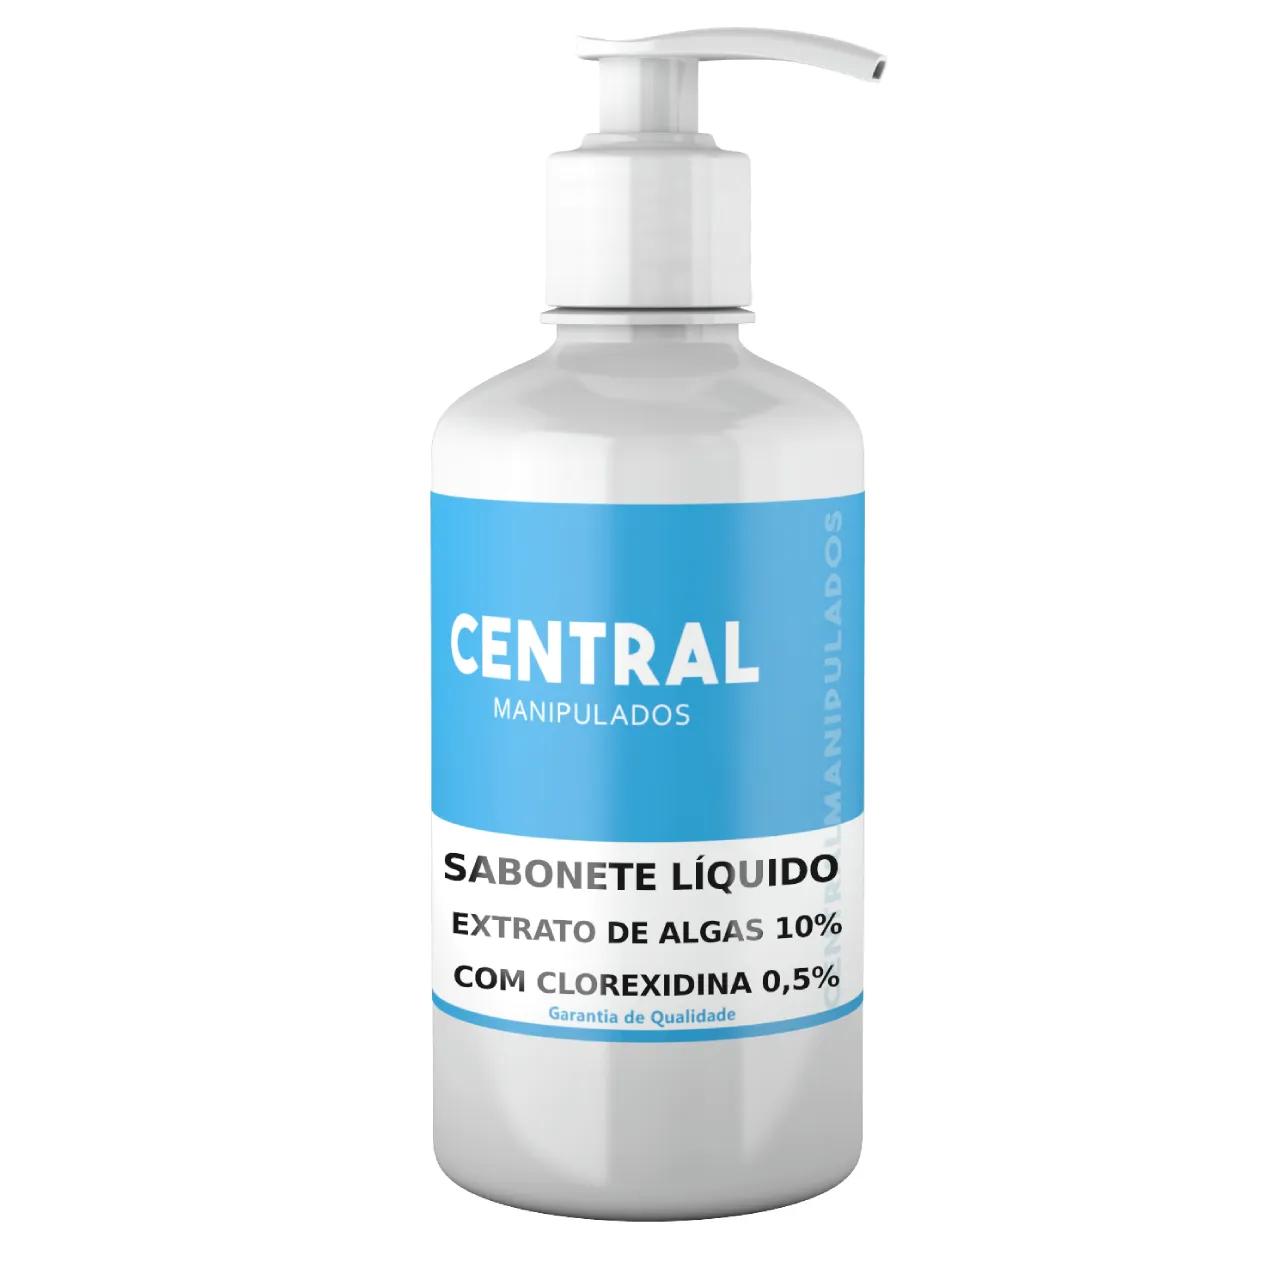 Clorexidina 0,5% + Extrato de Algas 10% - 200ML Sabonete Líquido - Uso externo para Celulite, Cicatrizante, Antisséptico , Antifúngico, Bactericida